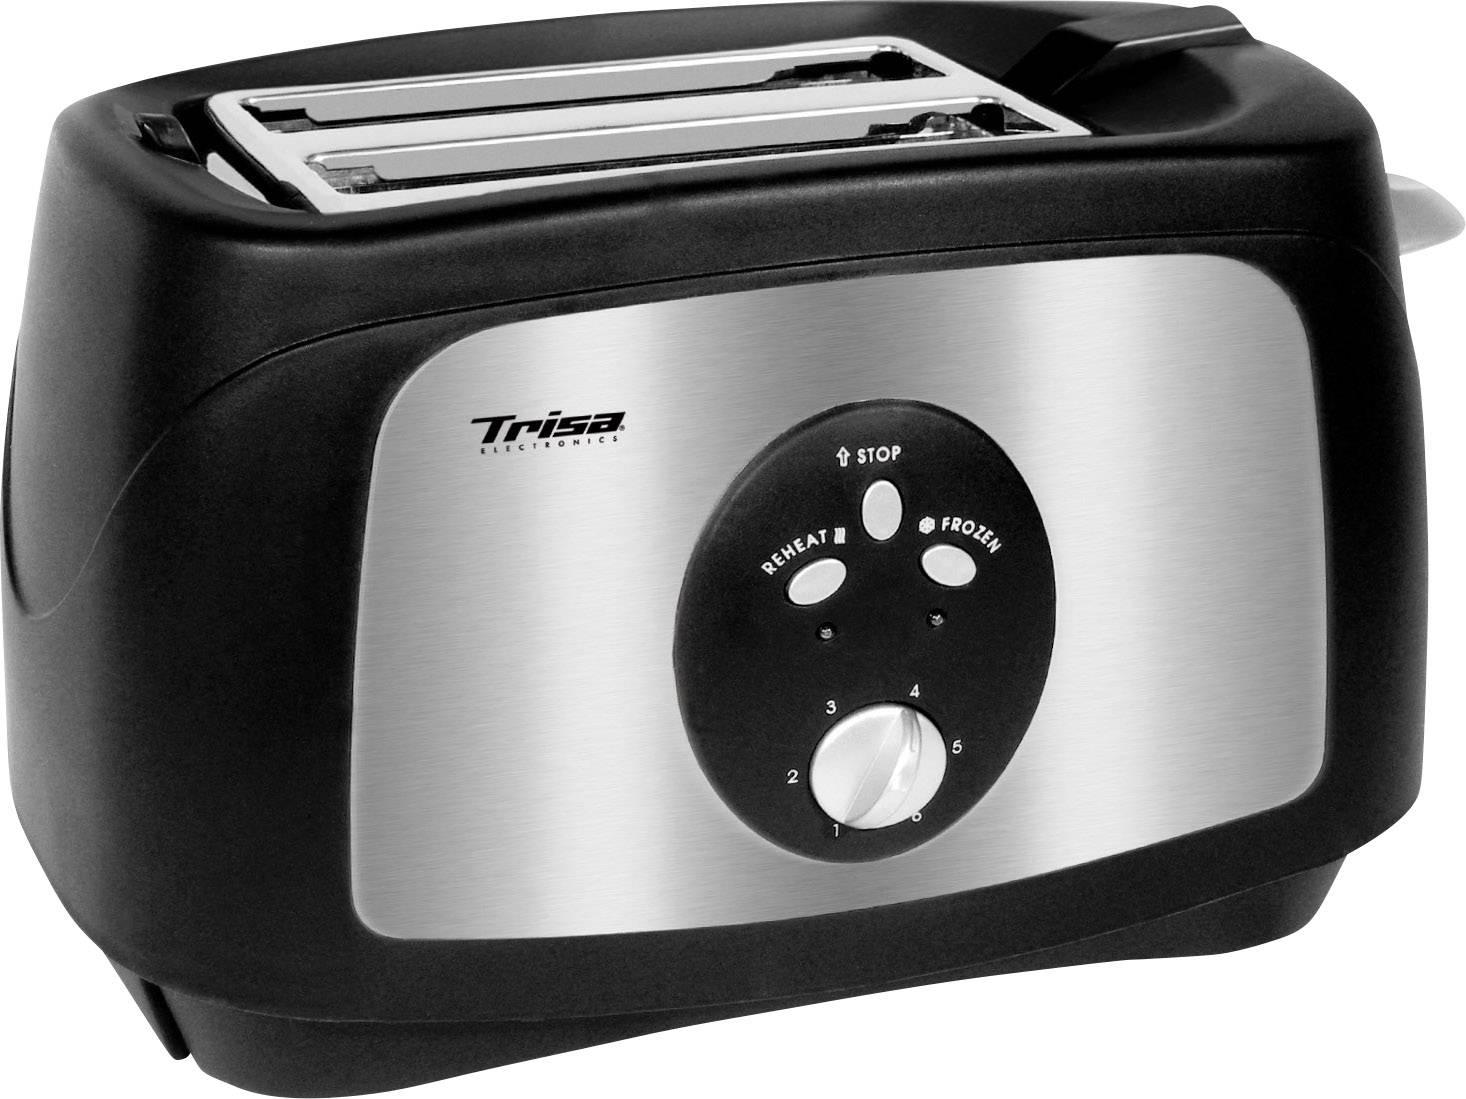 Trisa Crunchy Toast Tostapane